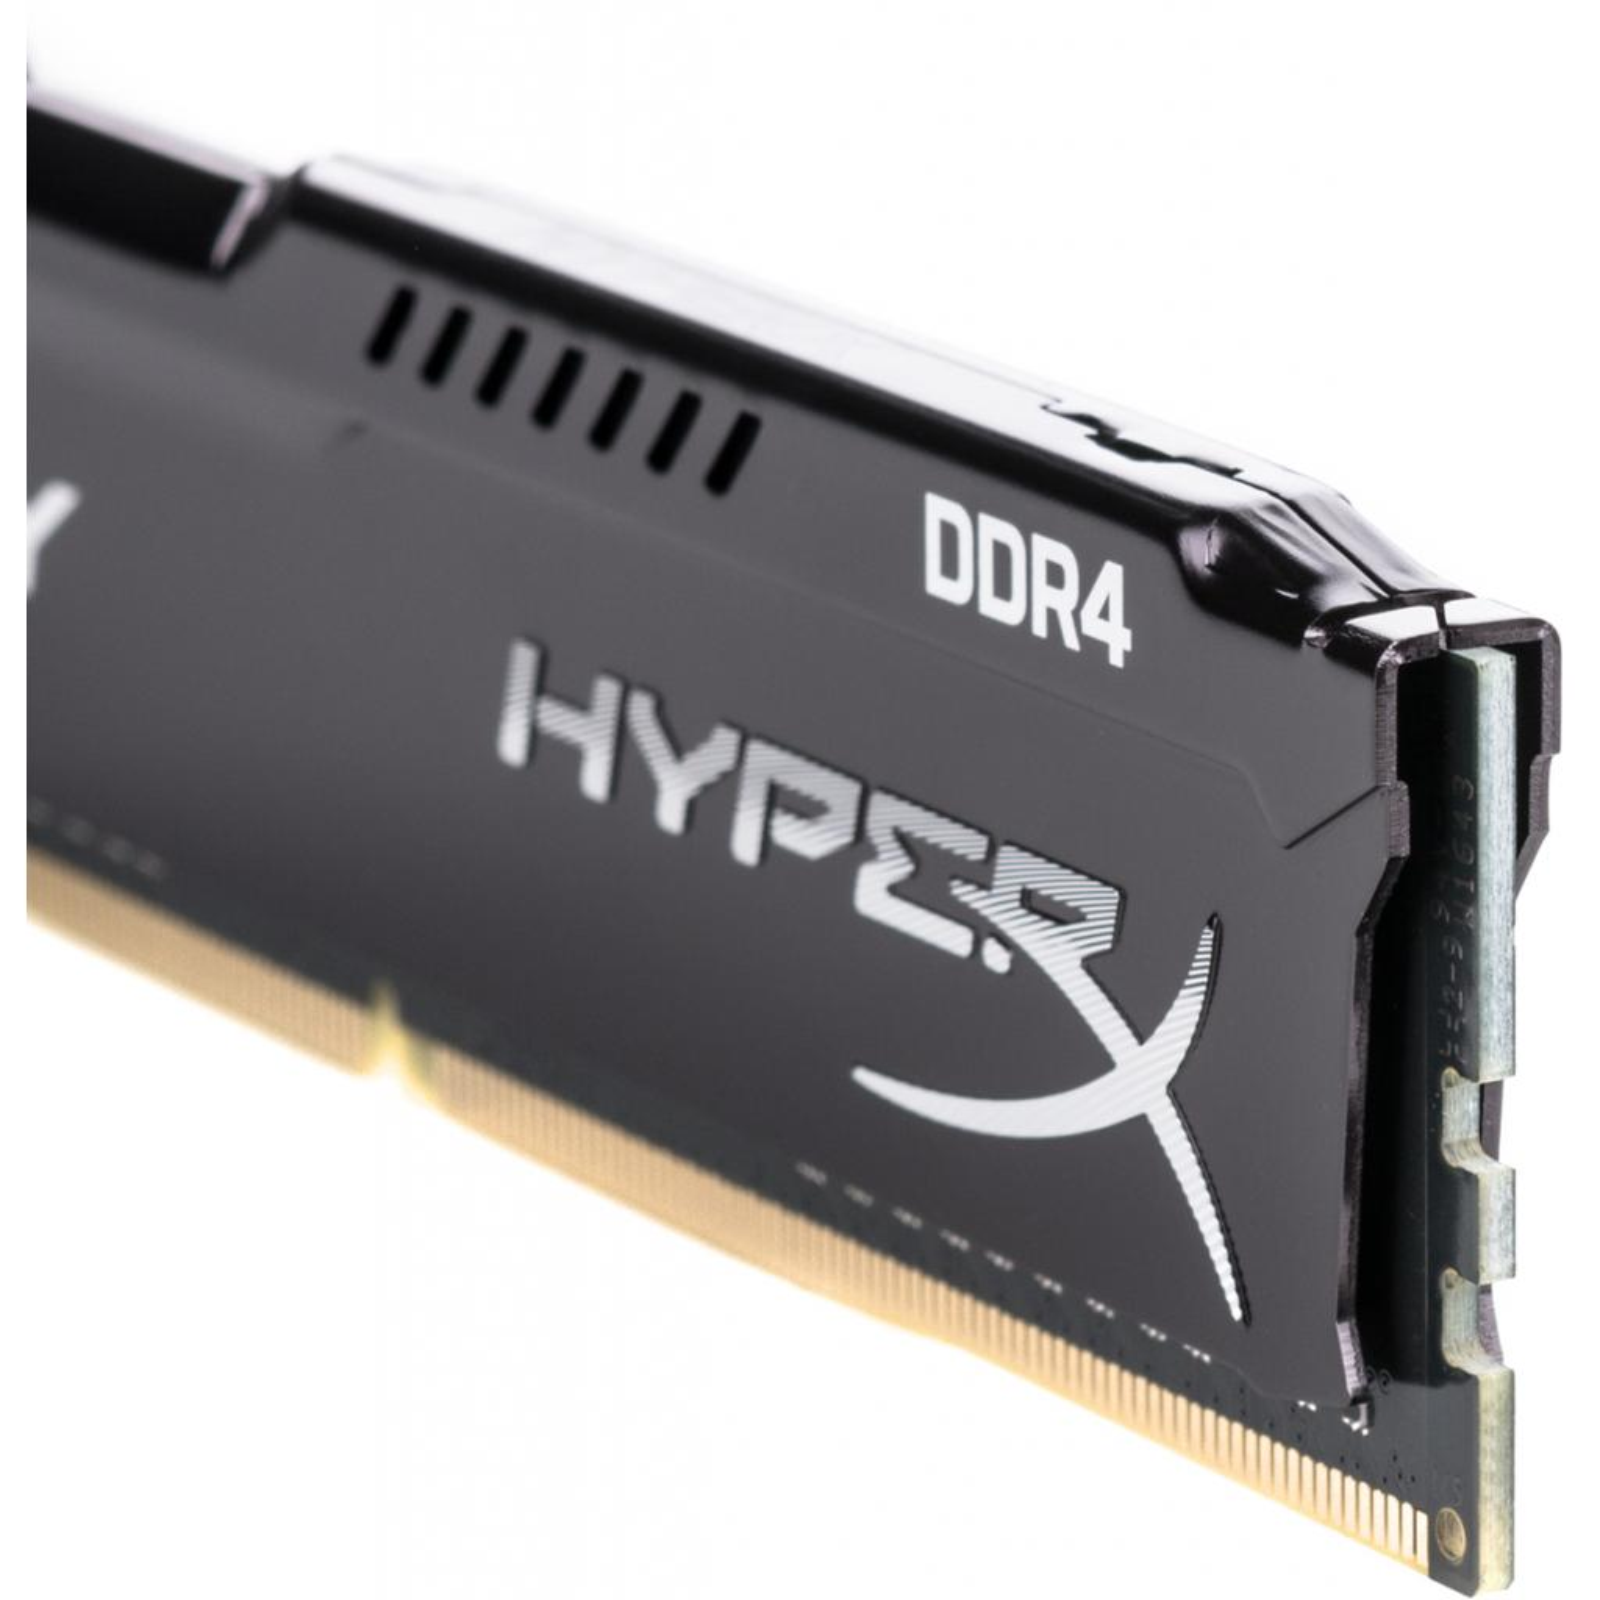 Модуль памяти для компьютера DDR4 16GB (2x8GB) 2133 MHz HyperX FURY Black HyperX (Kingston Fury) (HX421C14FB2K2/16) изображение 4